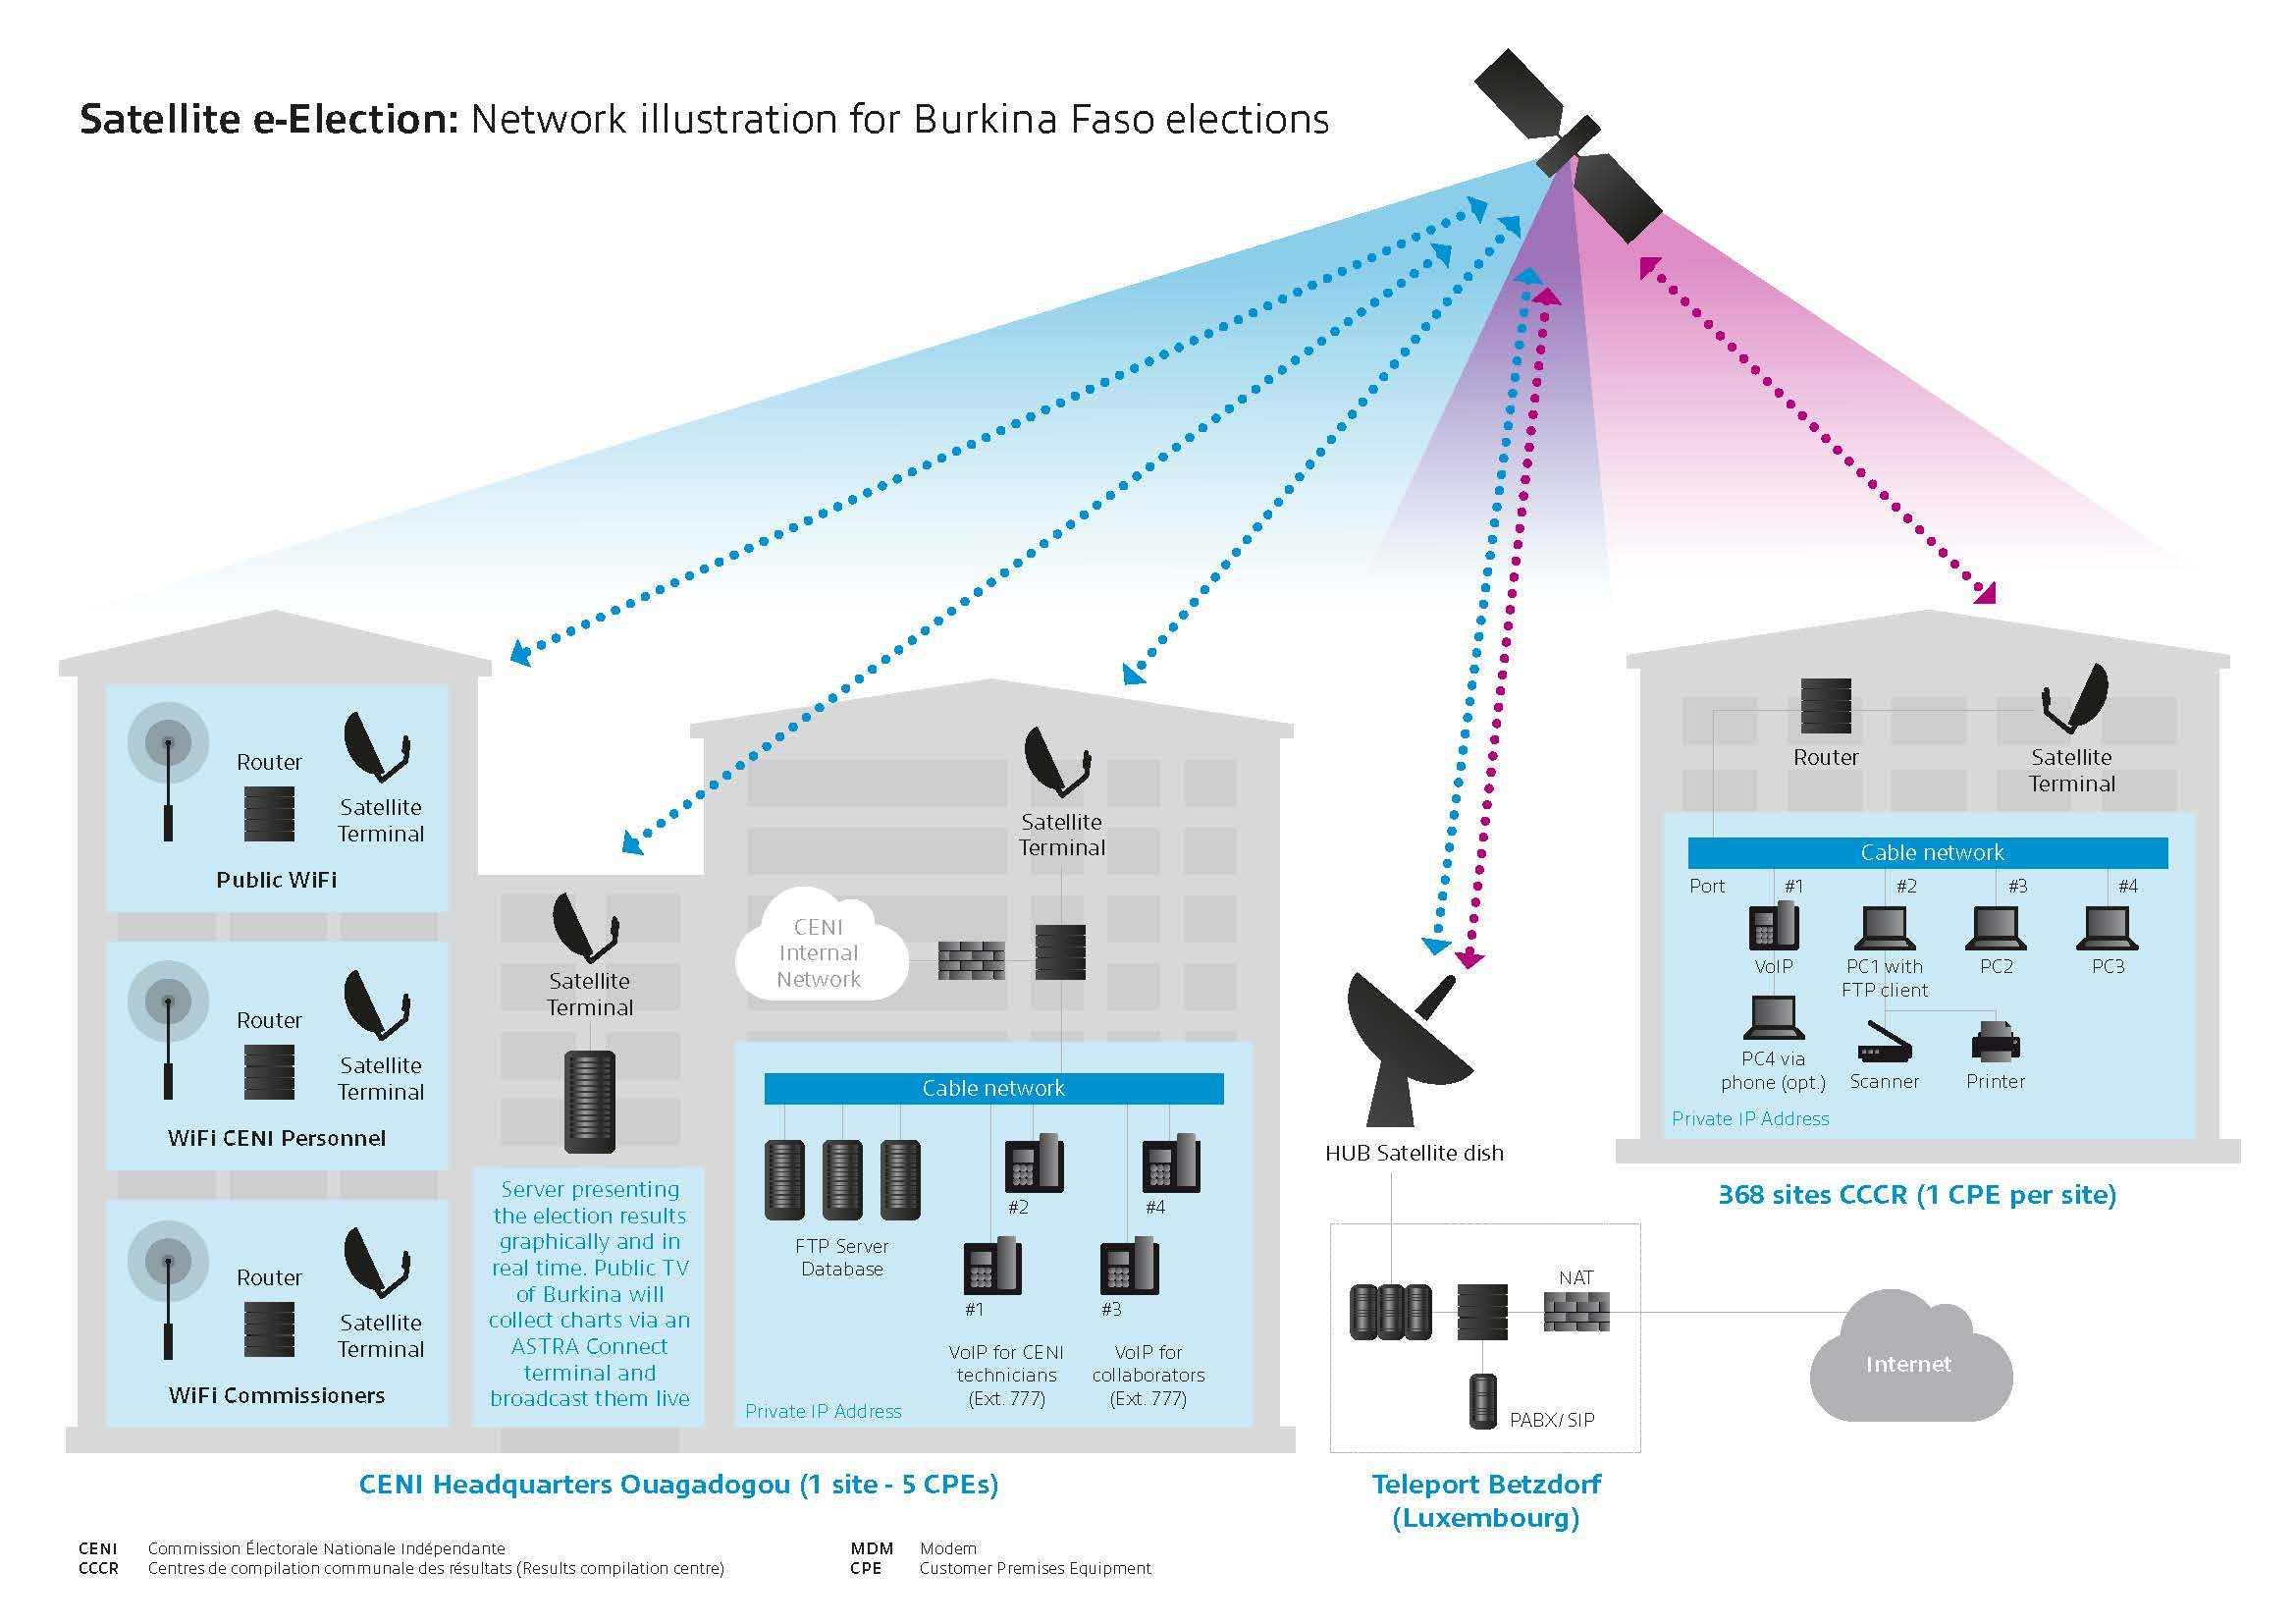 Ses And Ceni Partner To Provide Satellite Network For